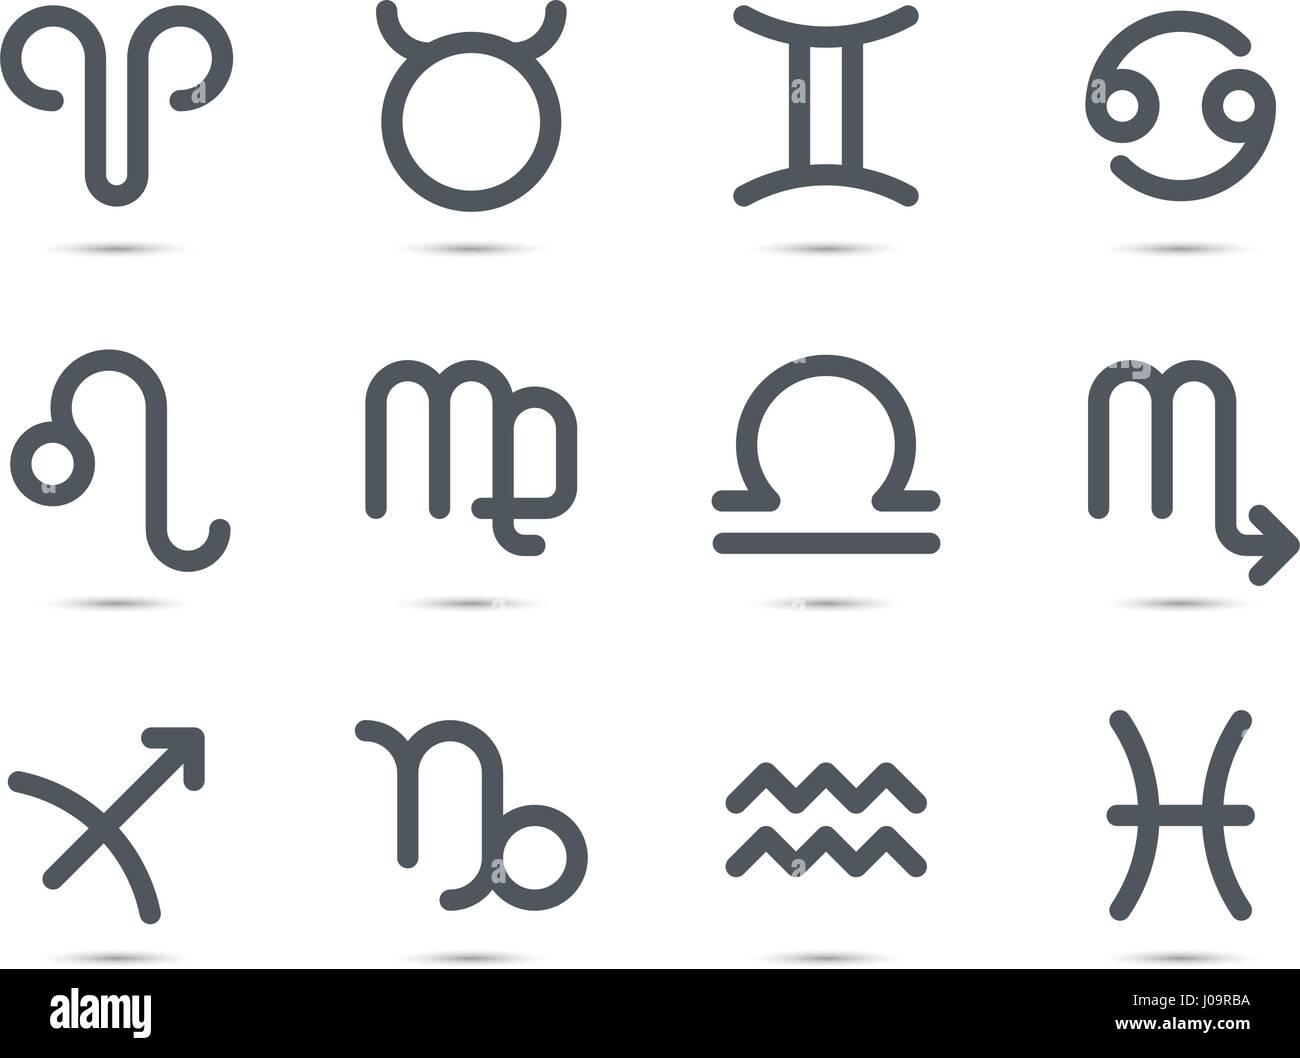 set of flat geometric zodiac symbols with shadow on white background